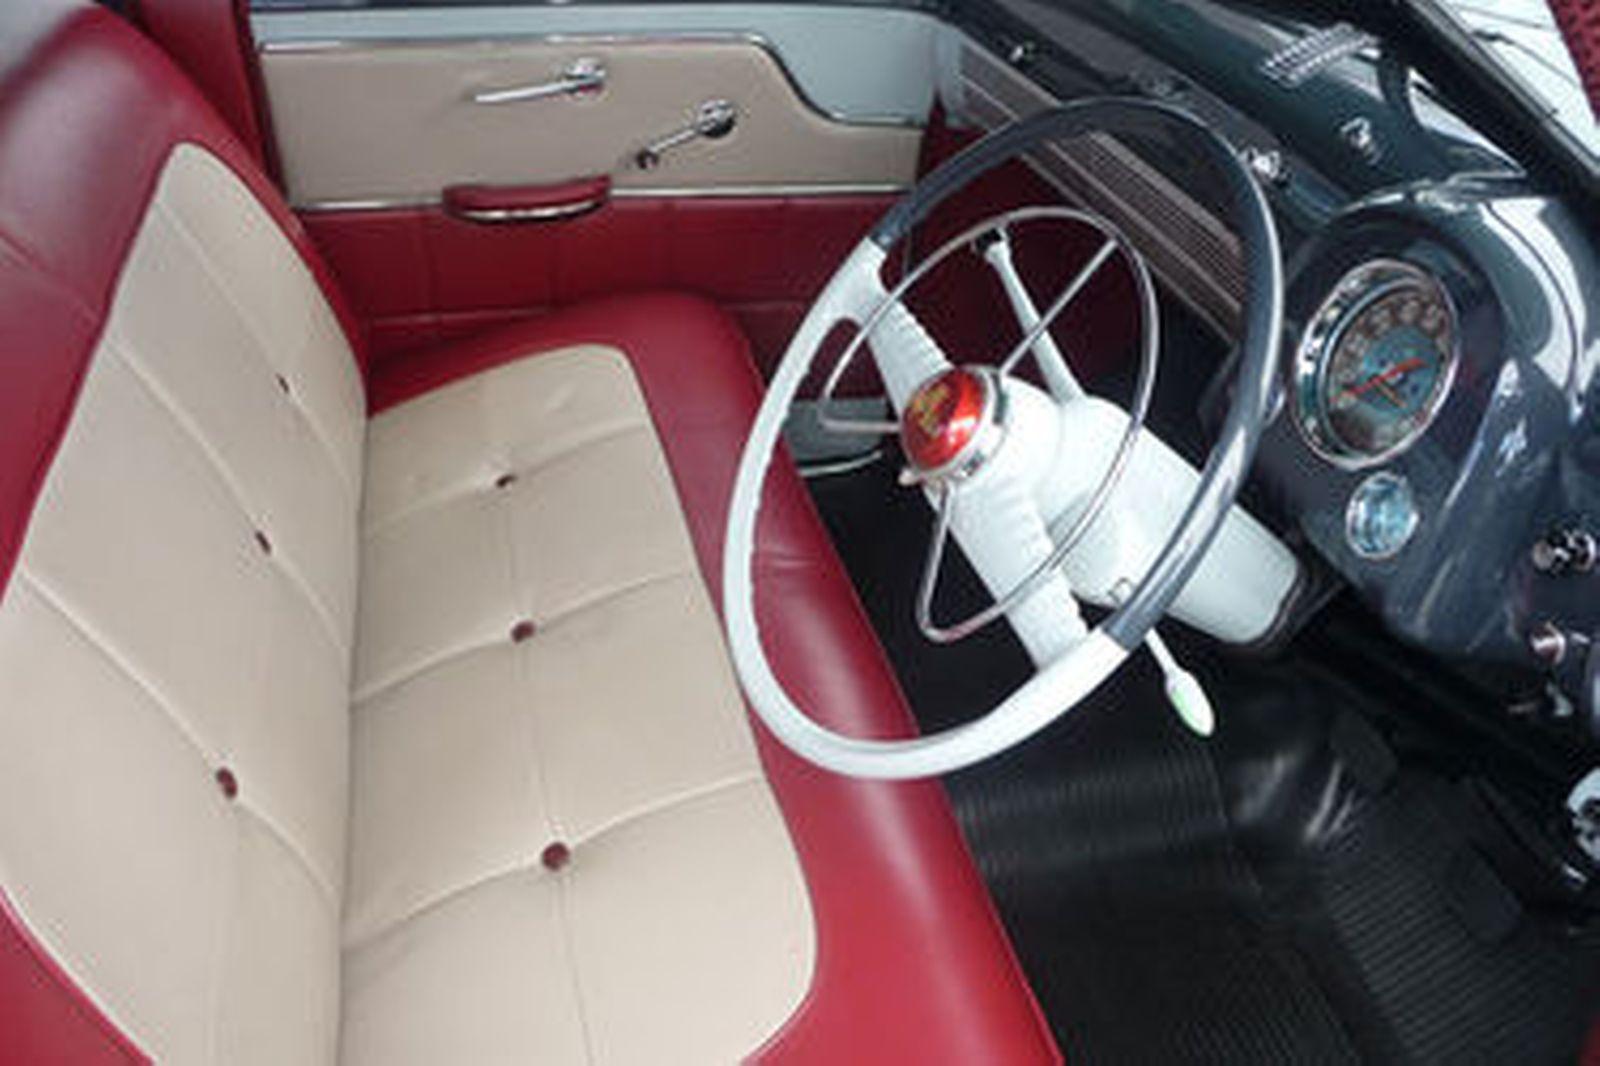 Sold: Holden FJ Special Sedan Auctions - Lot 9 - Shannons